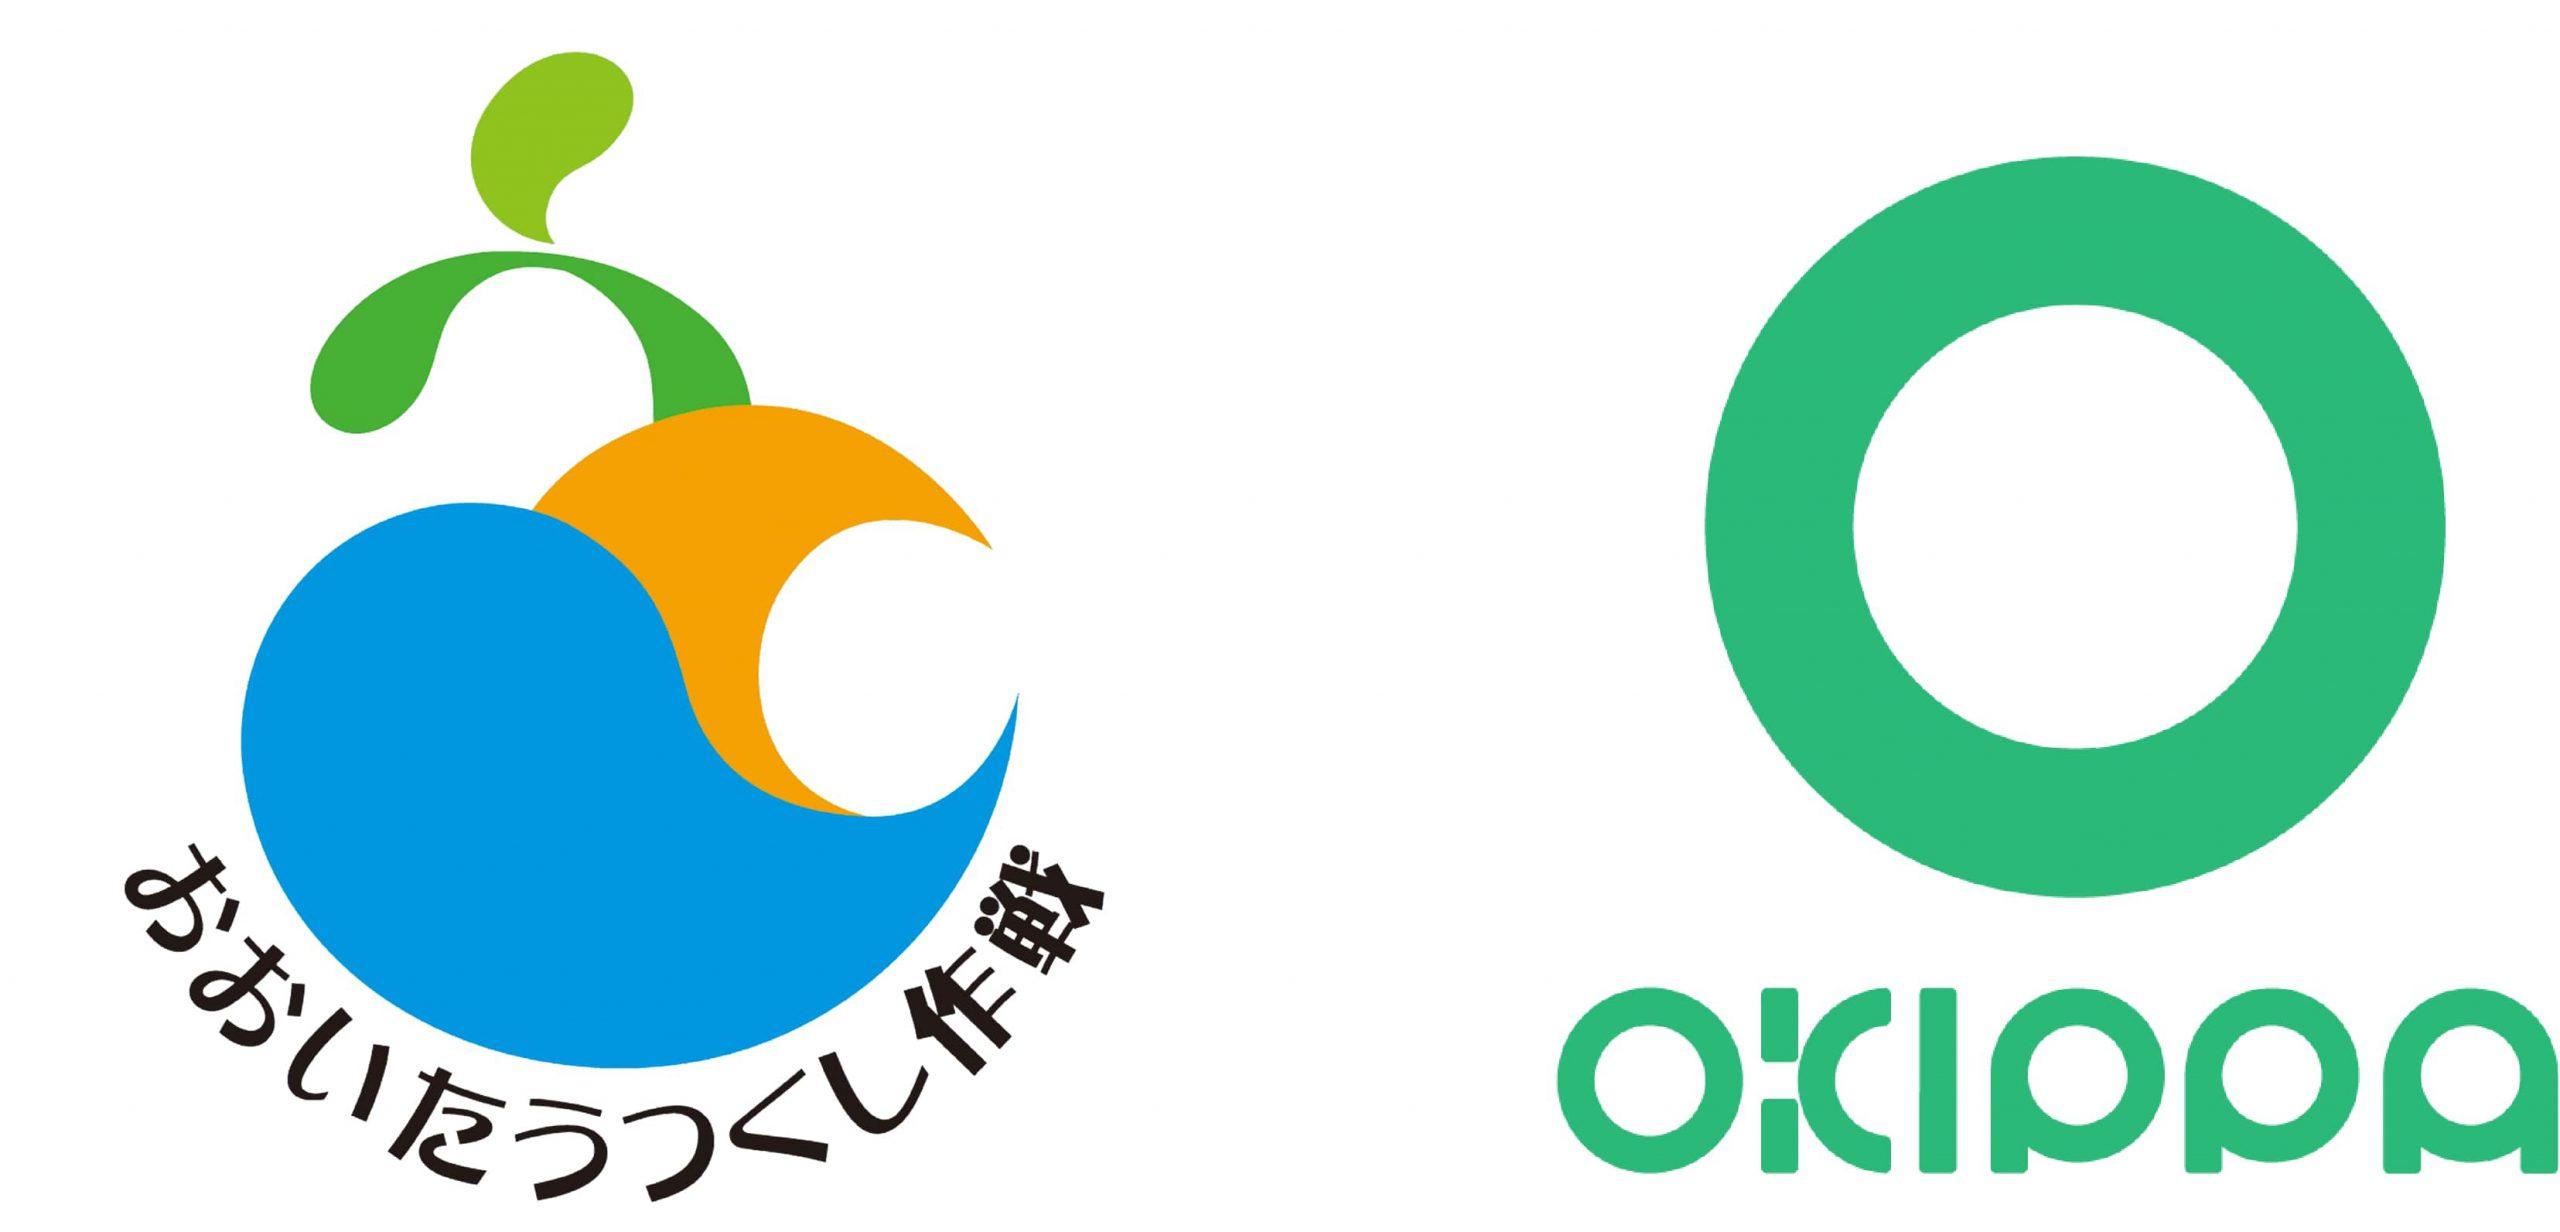 20210820_OKIPPAプレスリリース_大分県宅配バッグモニターf.